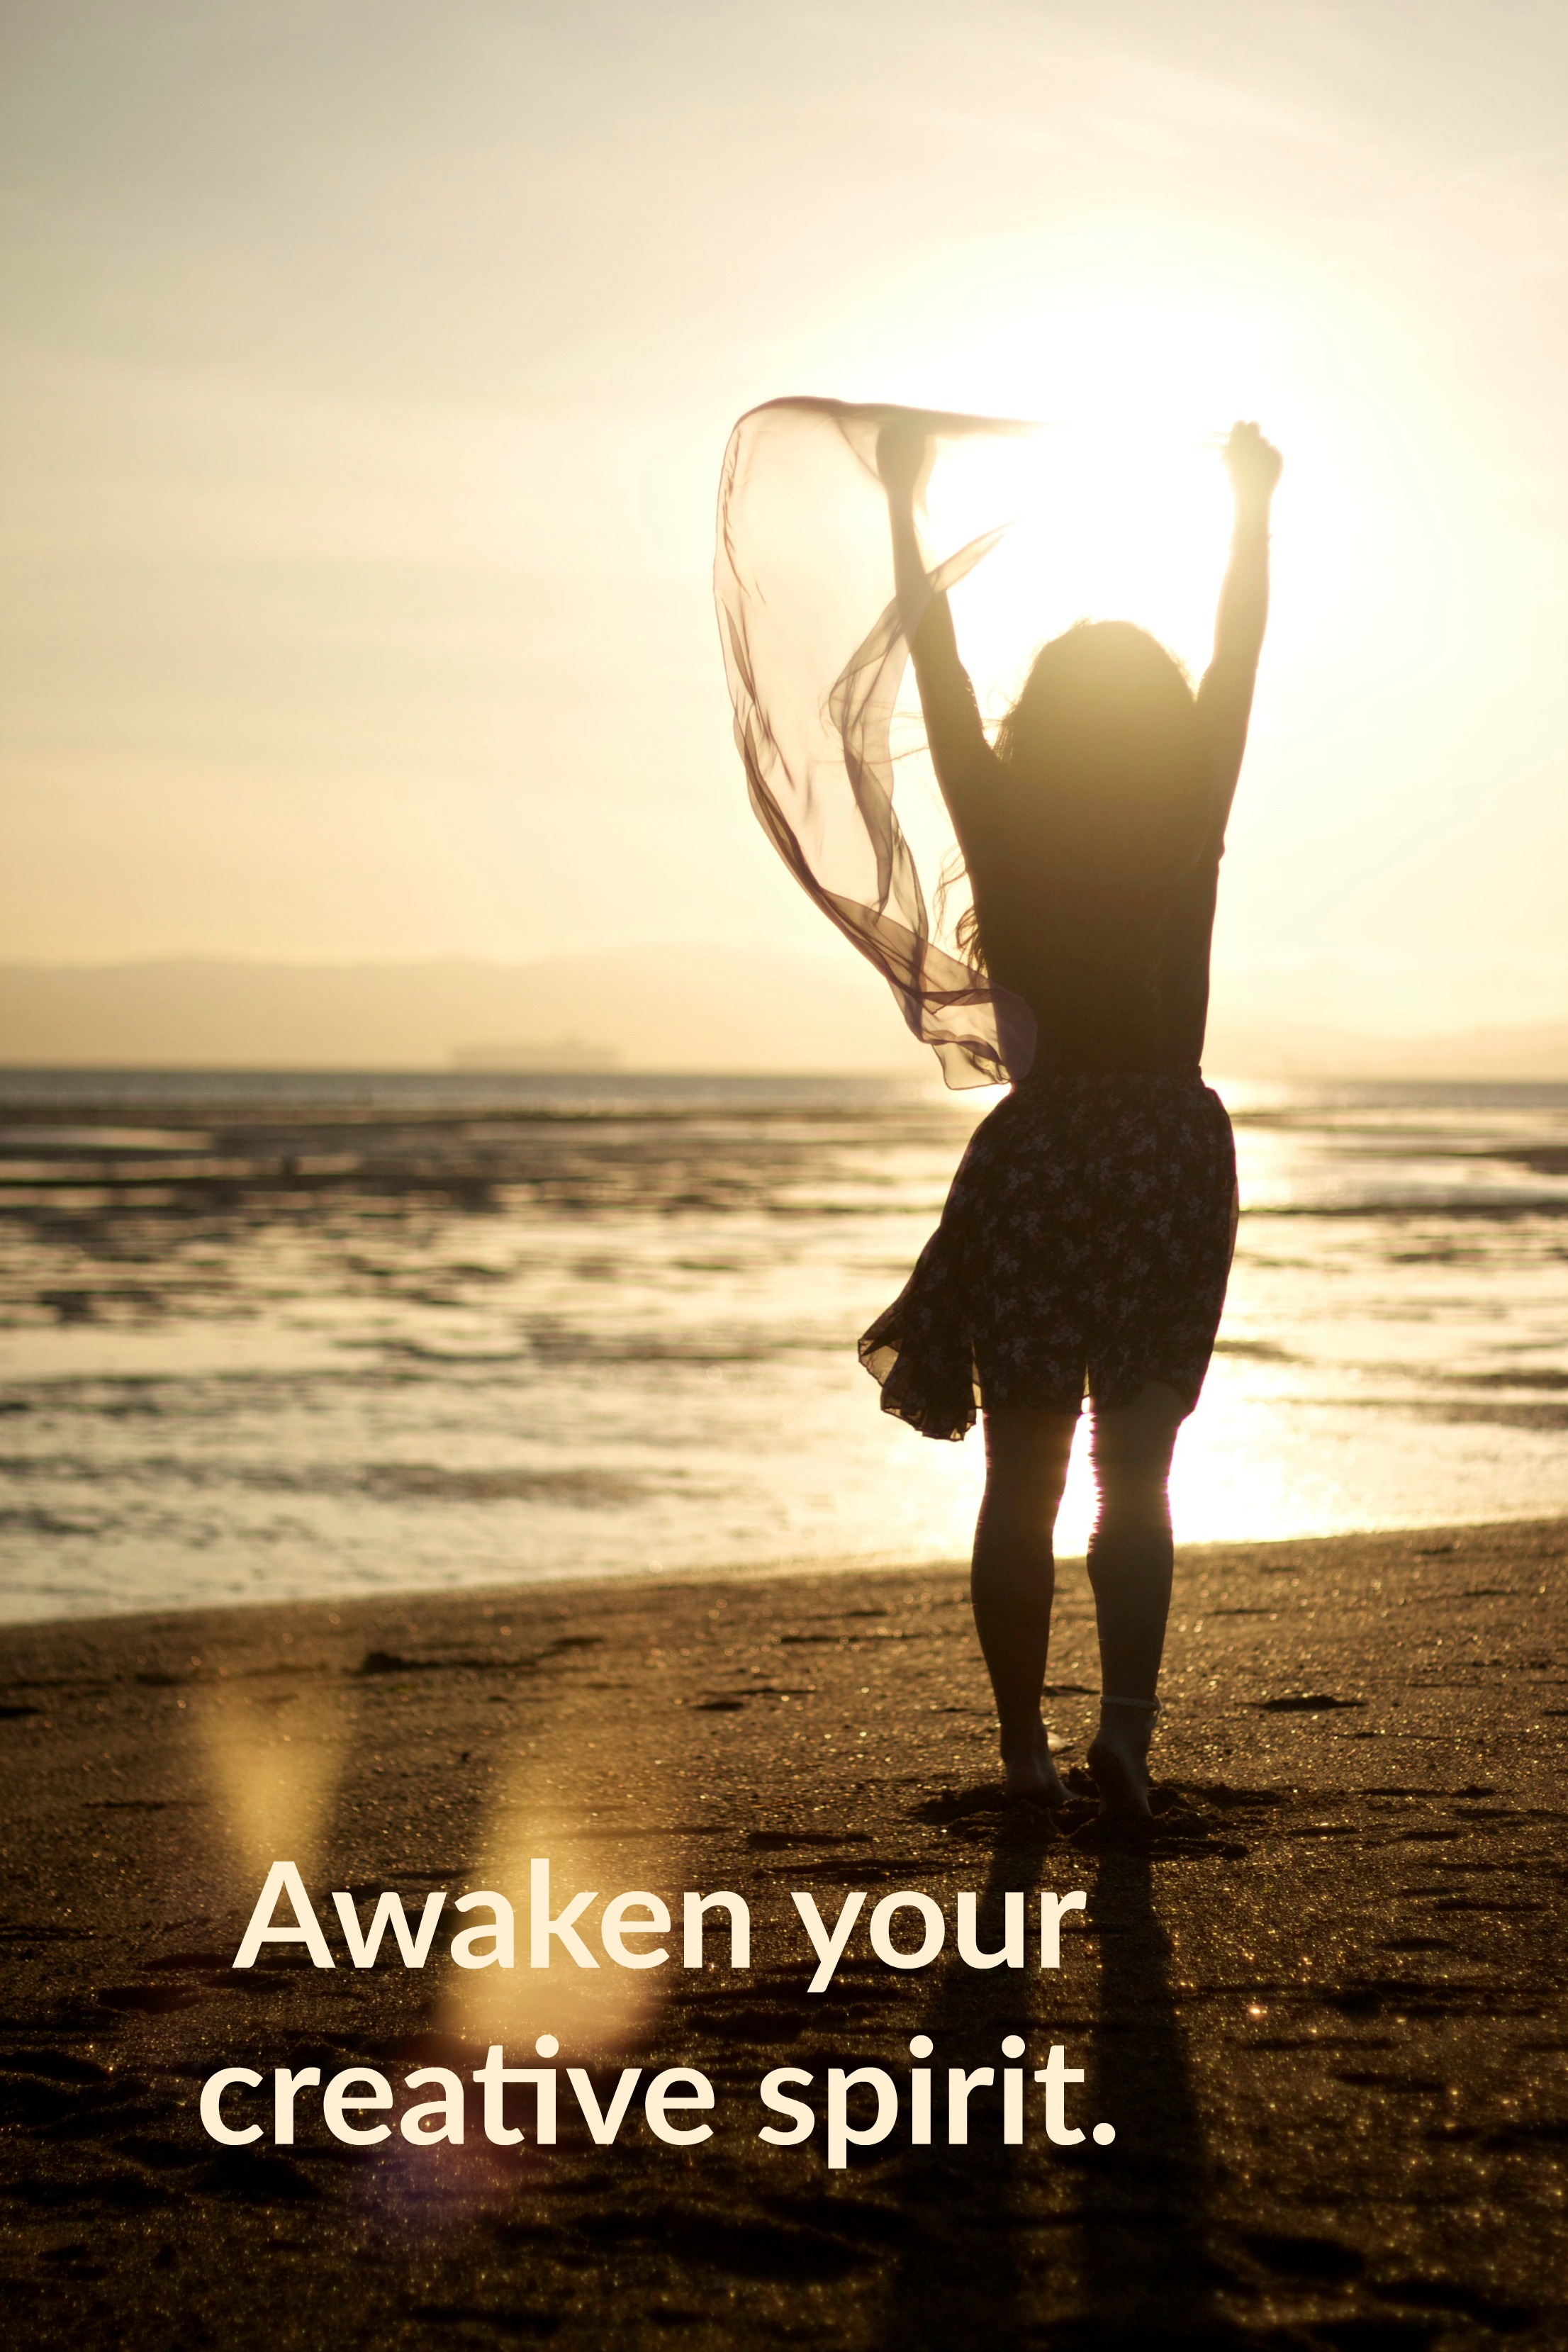 awaken3.jpg